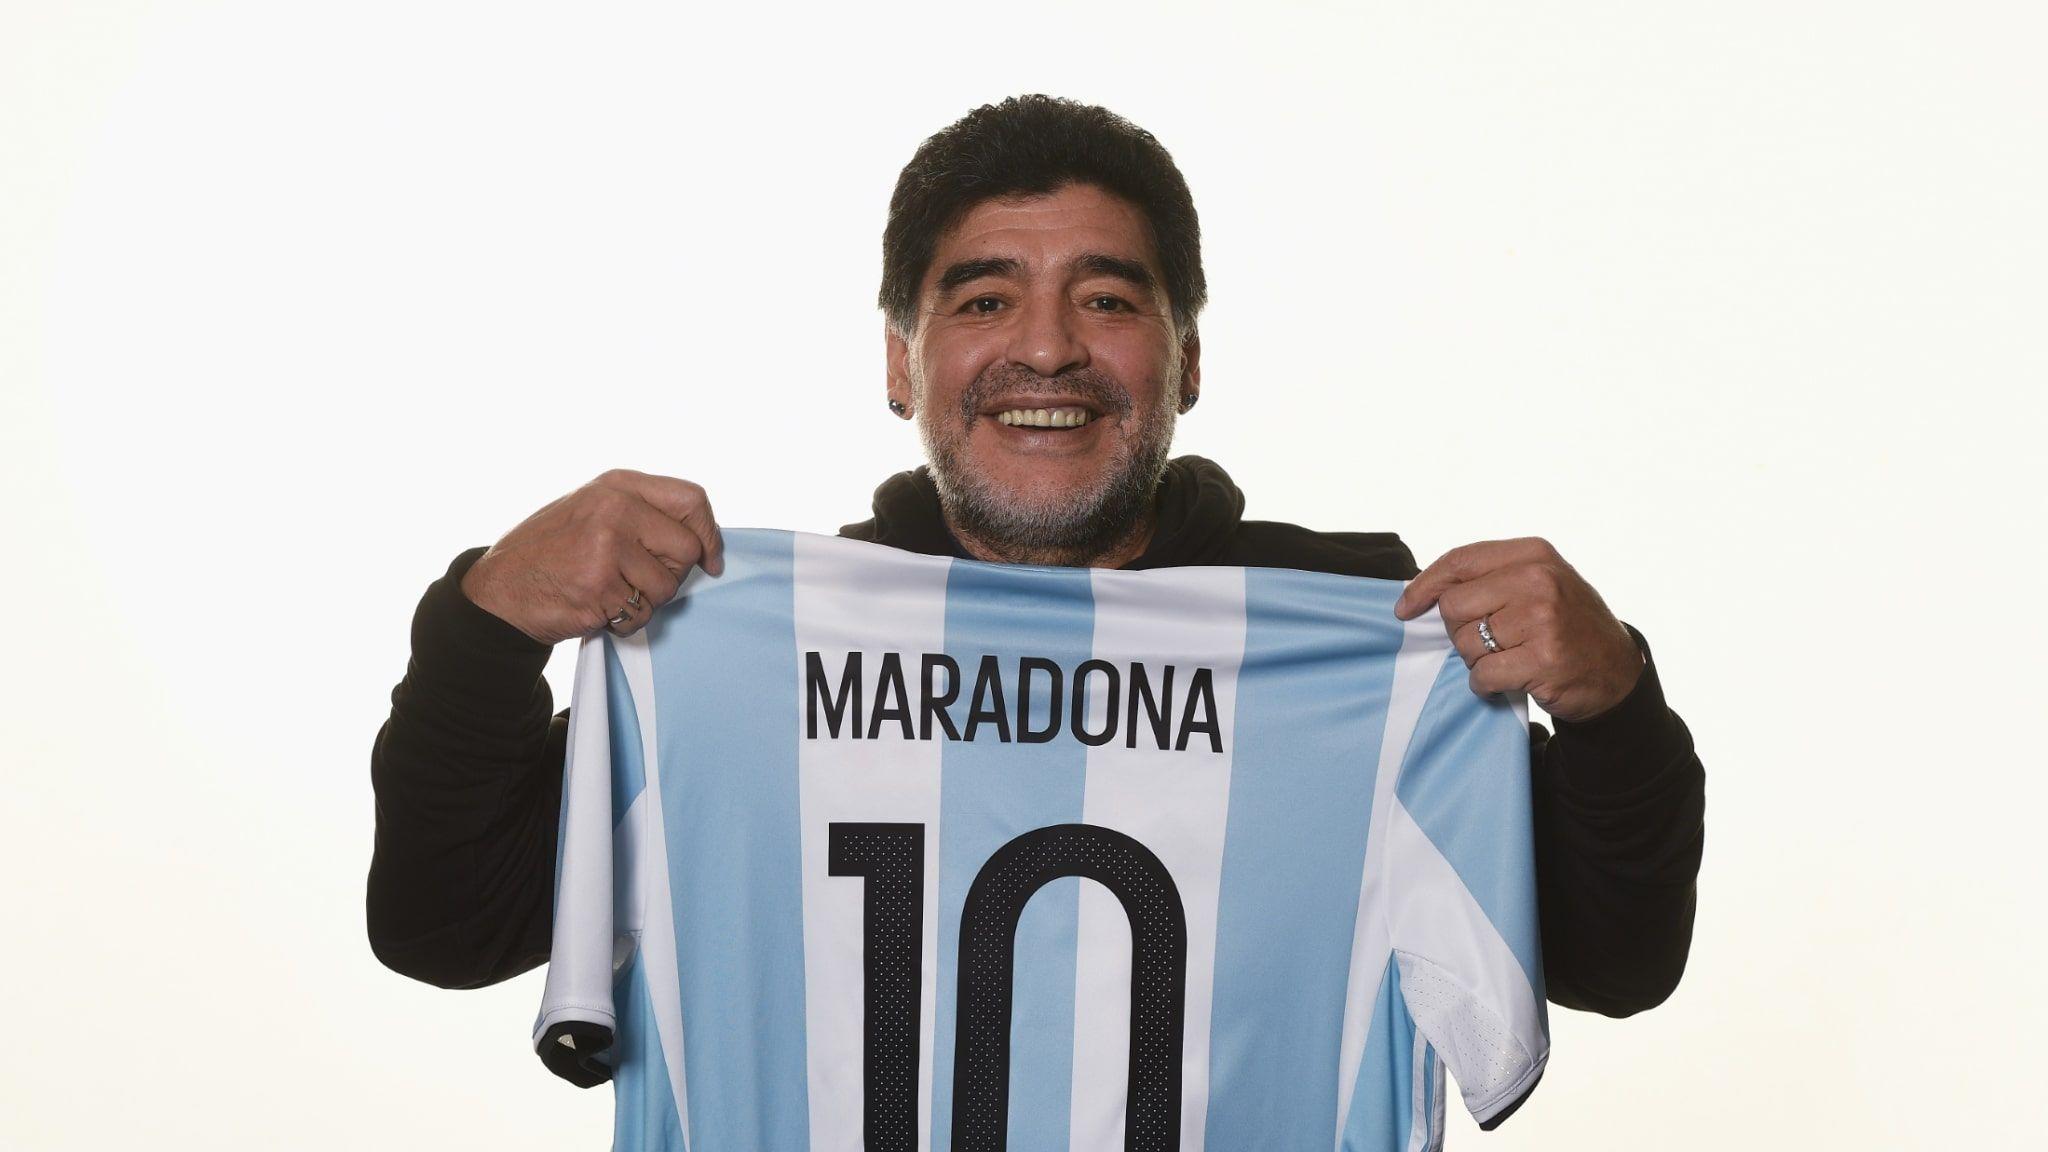 Dunia Sepak Bola Berduka Diego Maradona Meninggal Dunia Radar Bogor Berita Bogor Terpercaya